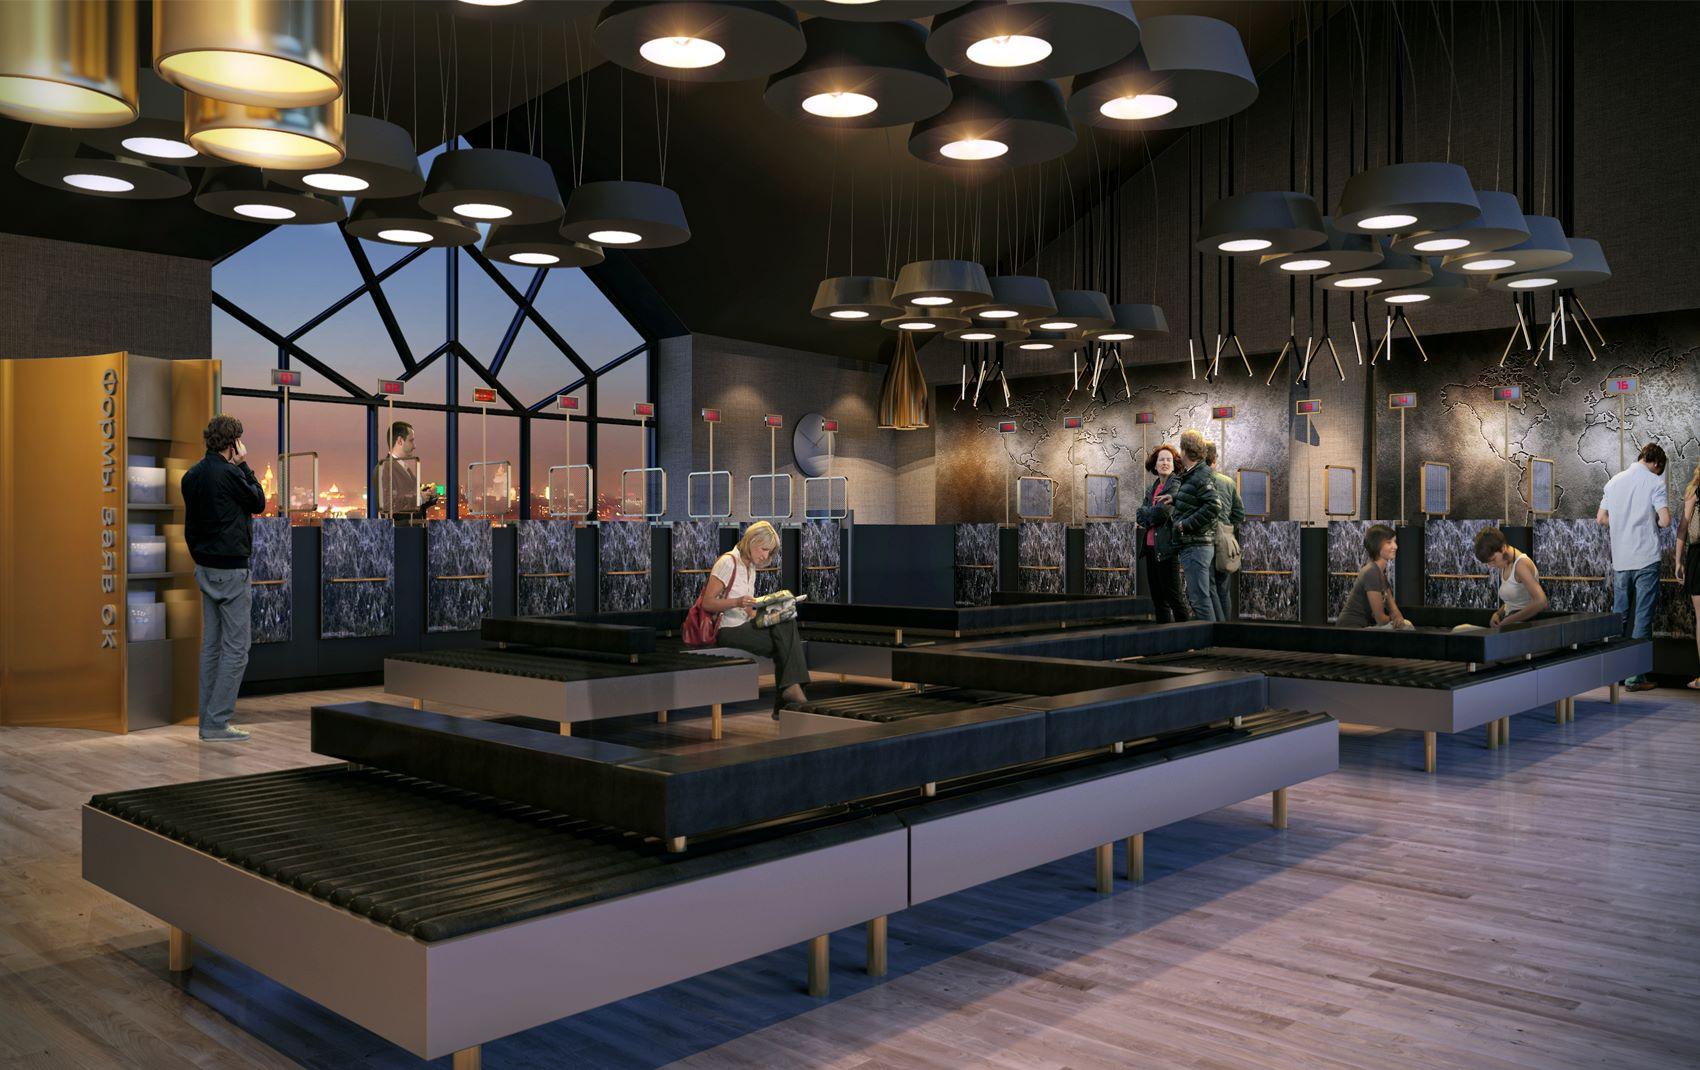 international visa centres - commercial luxury interior